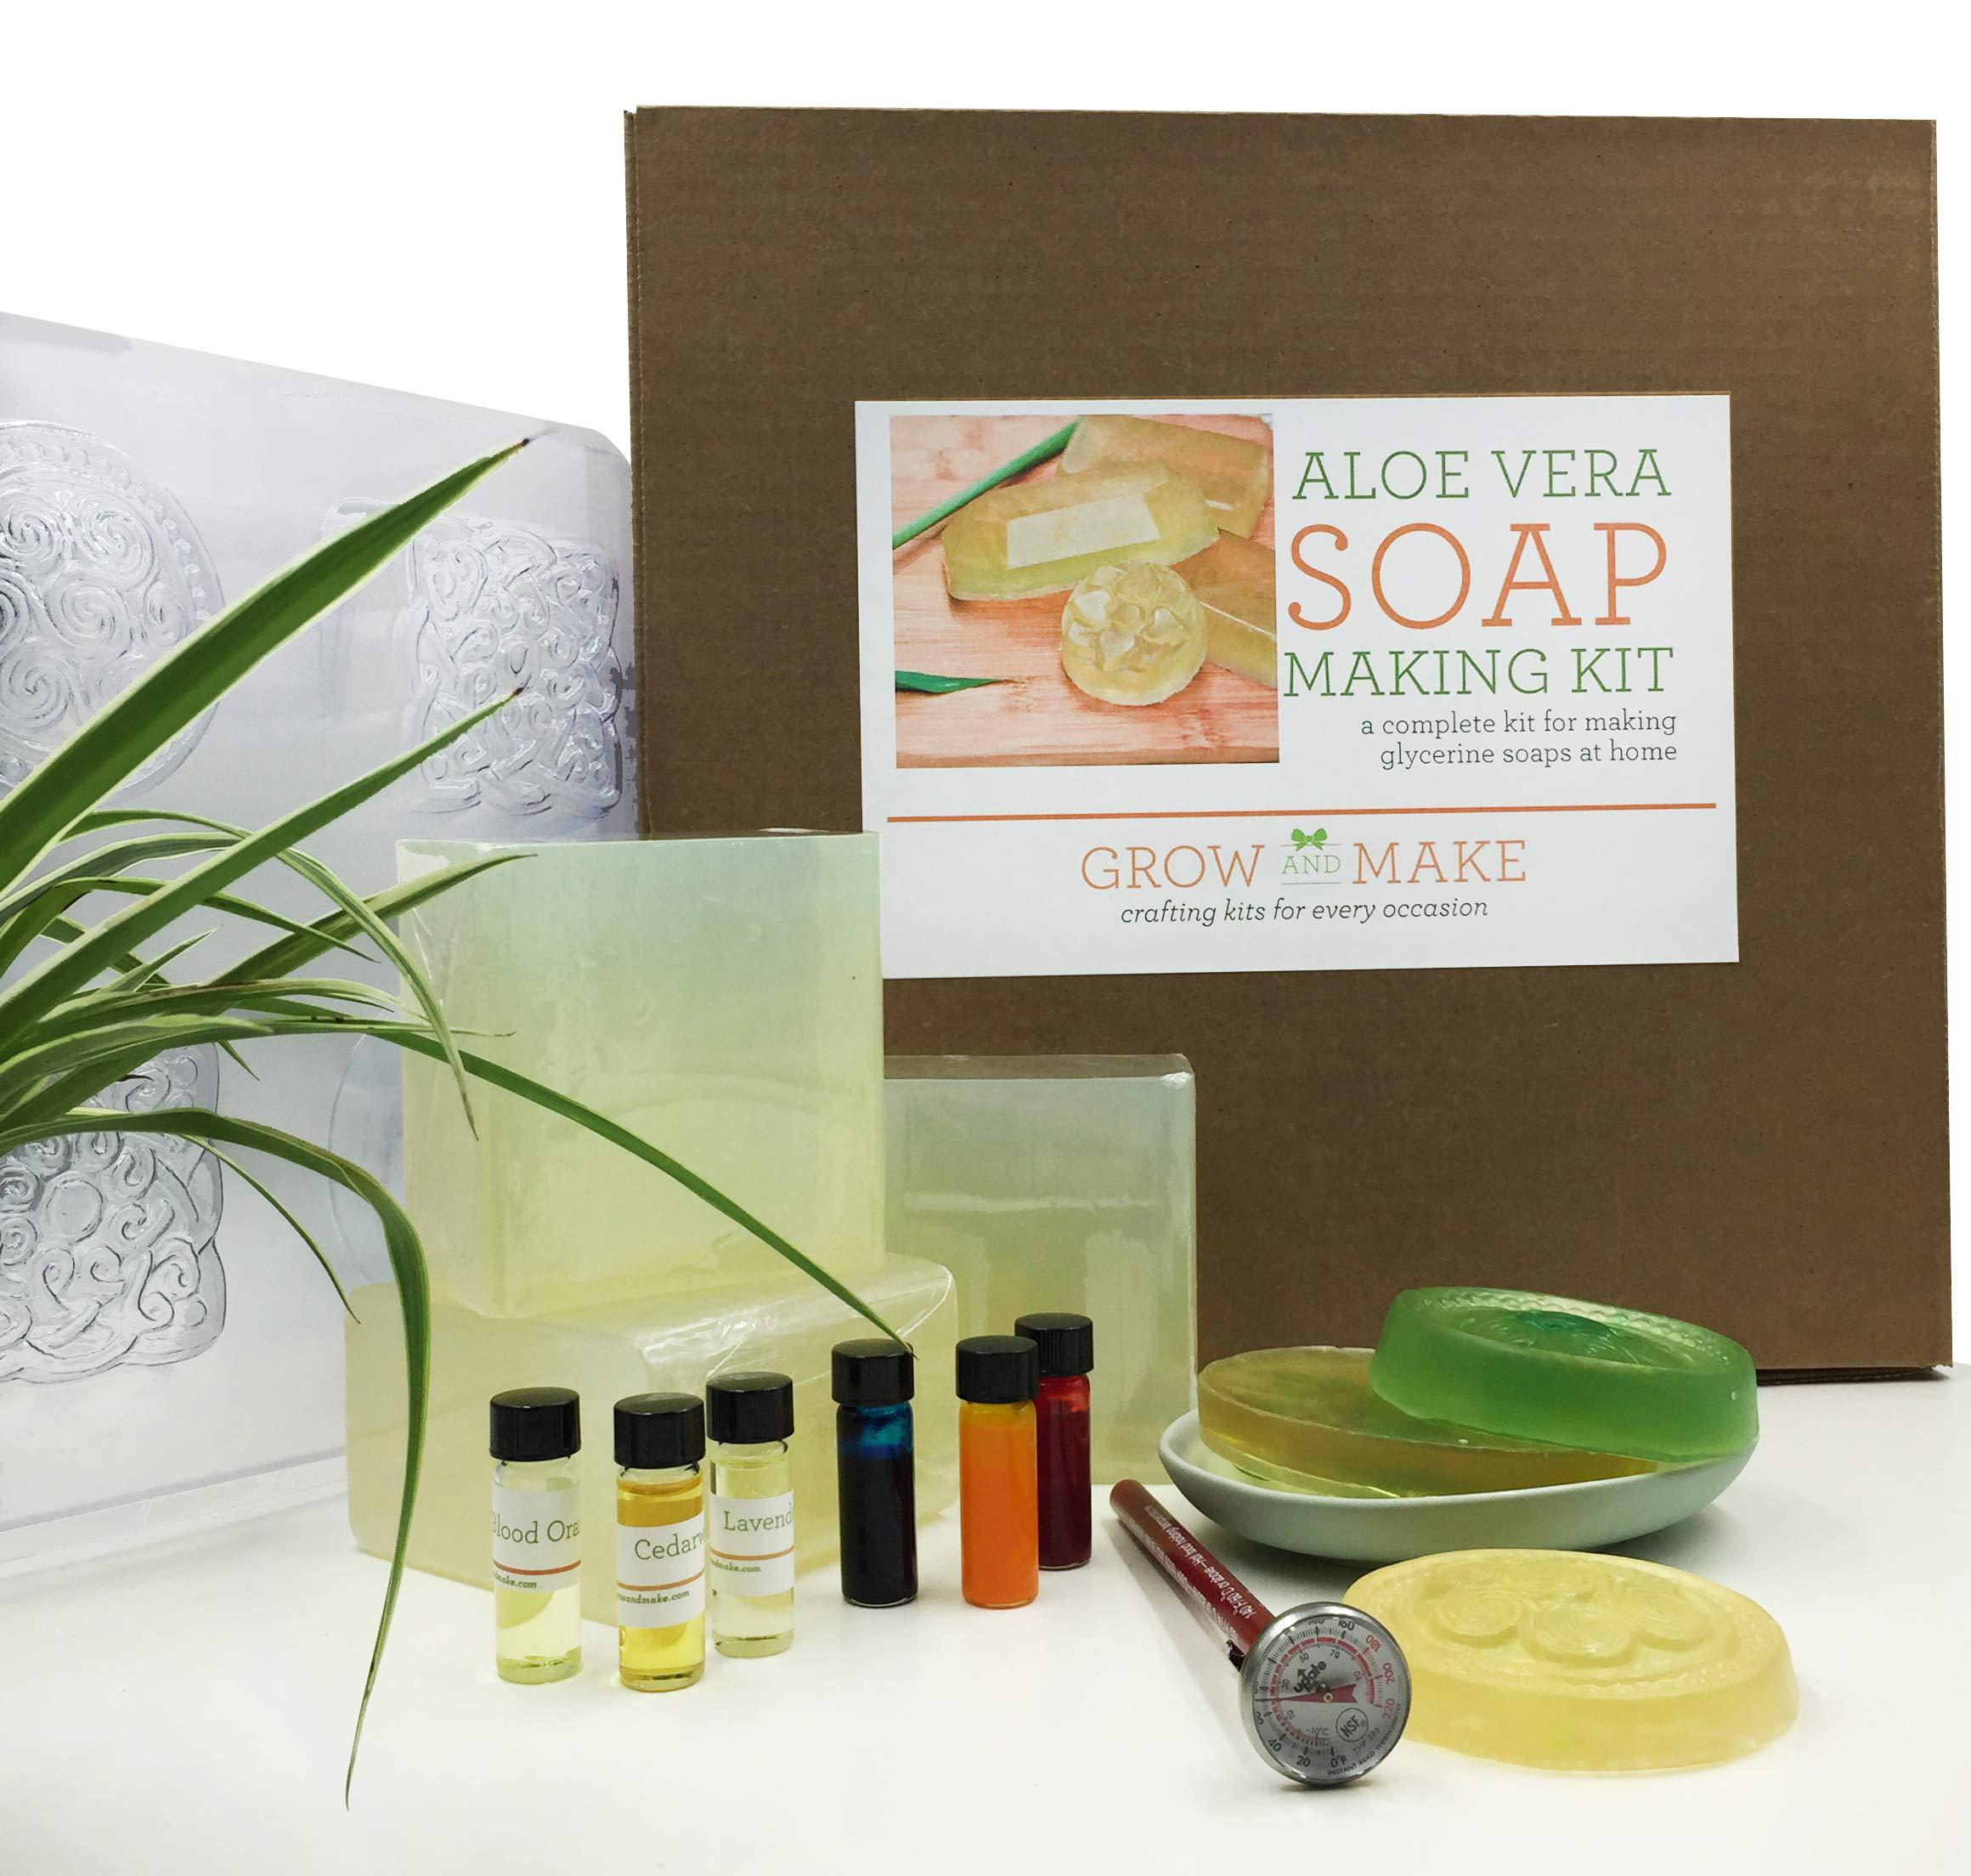 Grow and Make DIY Aloe Vera Soap Making Kit - Learn how to make home made natural soap!